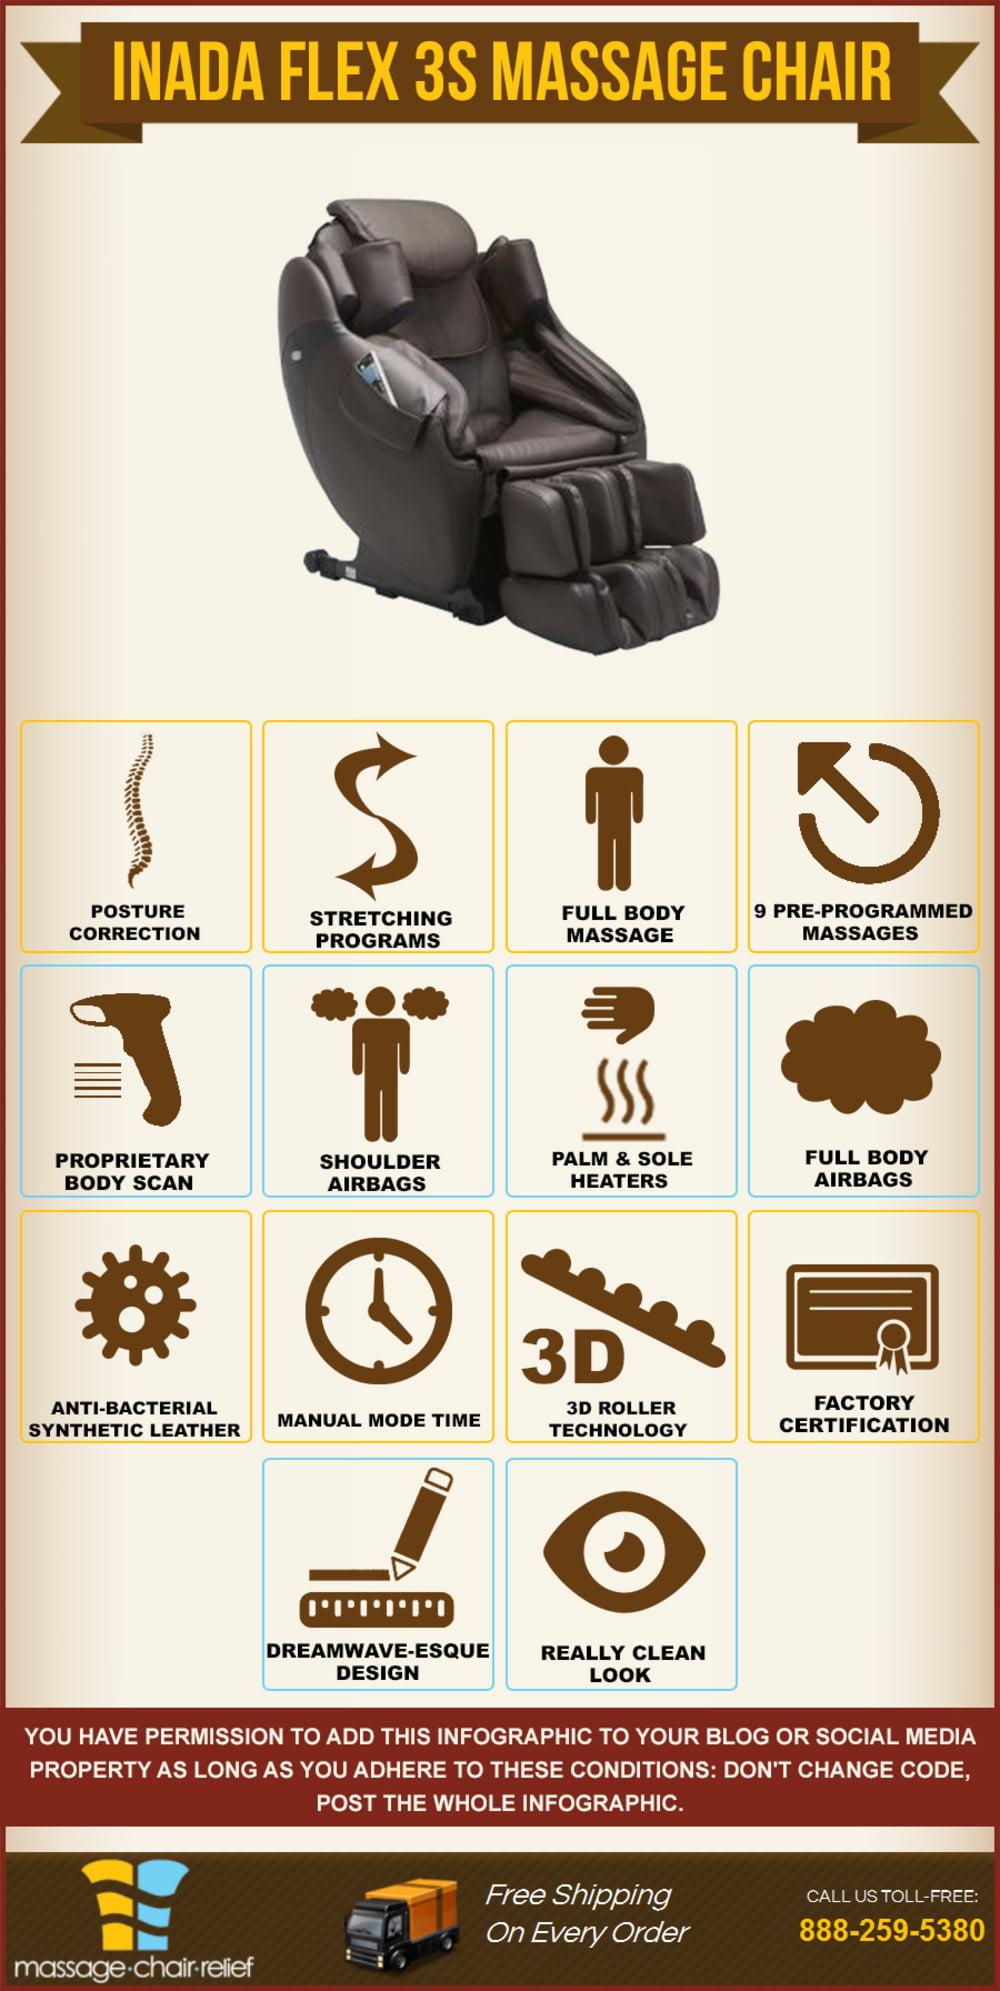 Inada Flex 3S – Infographic